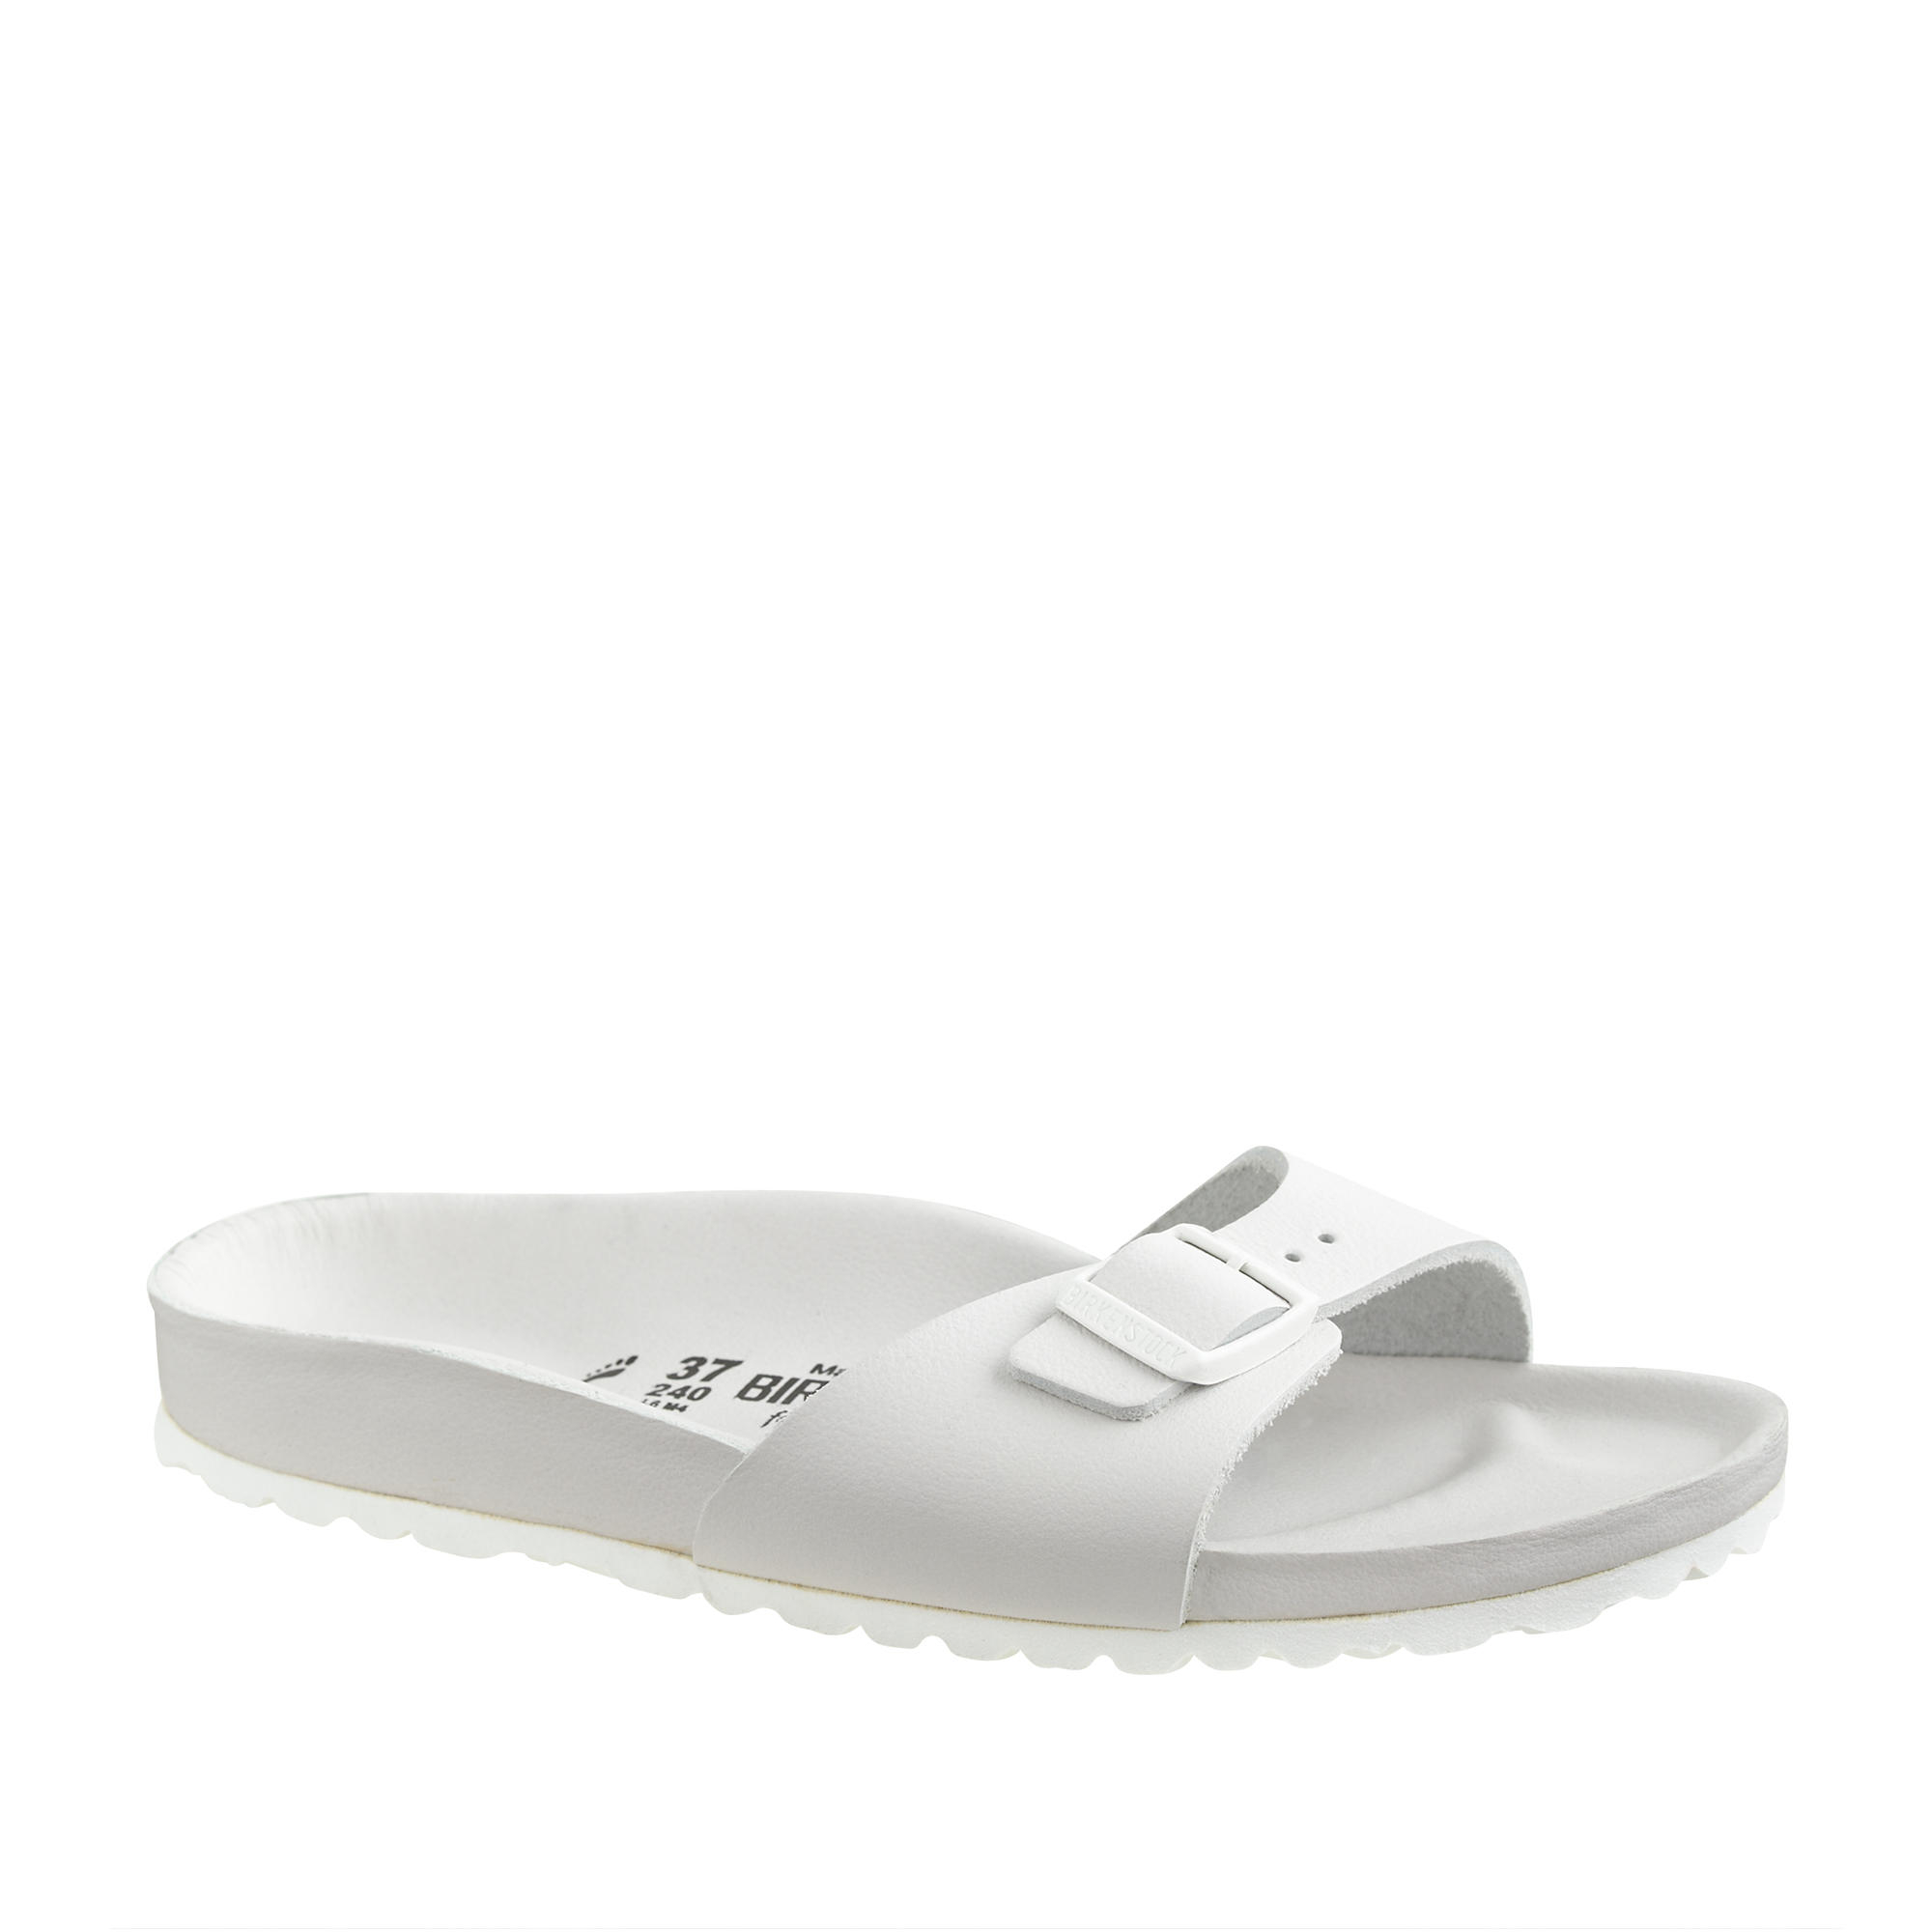 bfda9d0ab2710 Lyst - J.Crew Women s Birkenstock Madrid Exquisite Sandals in White